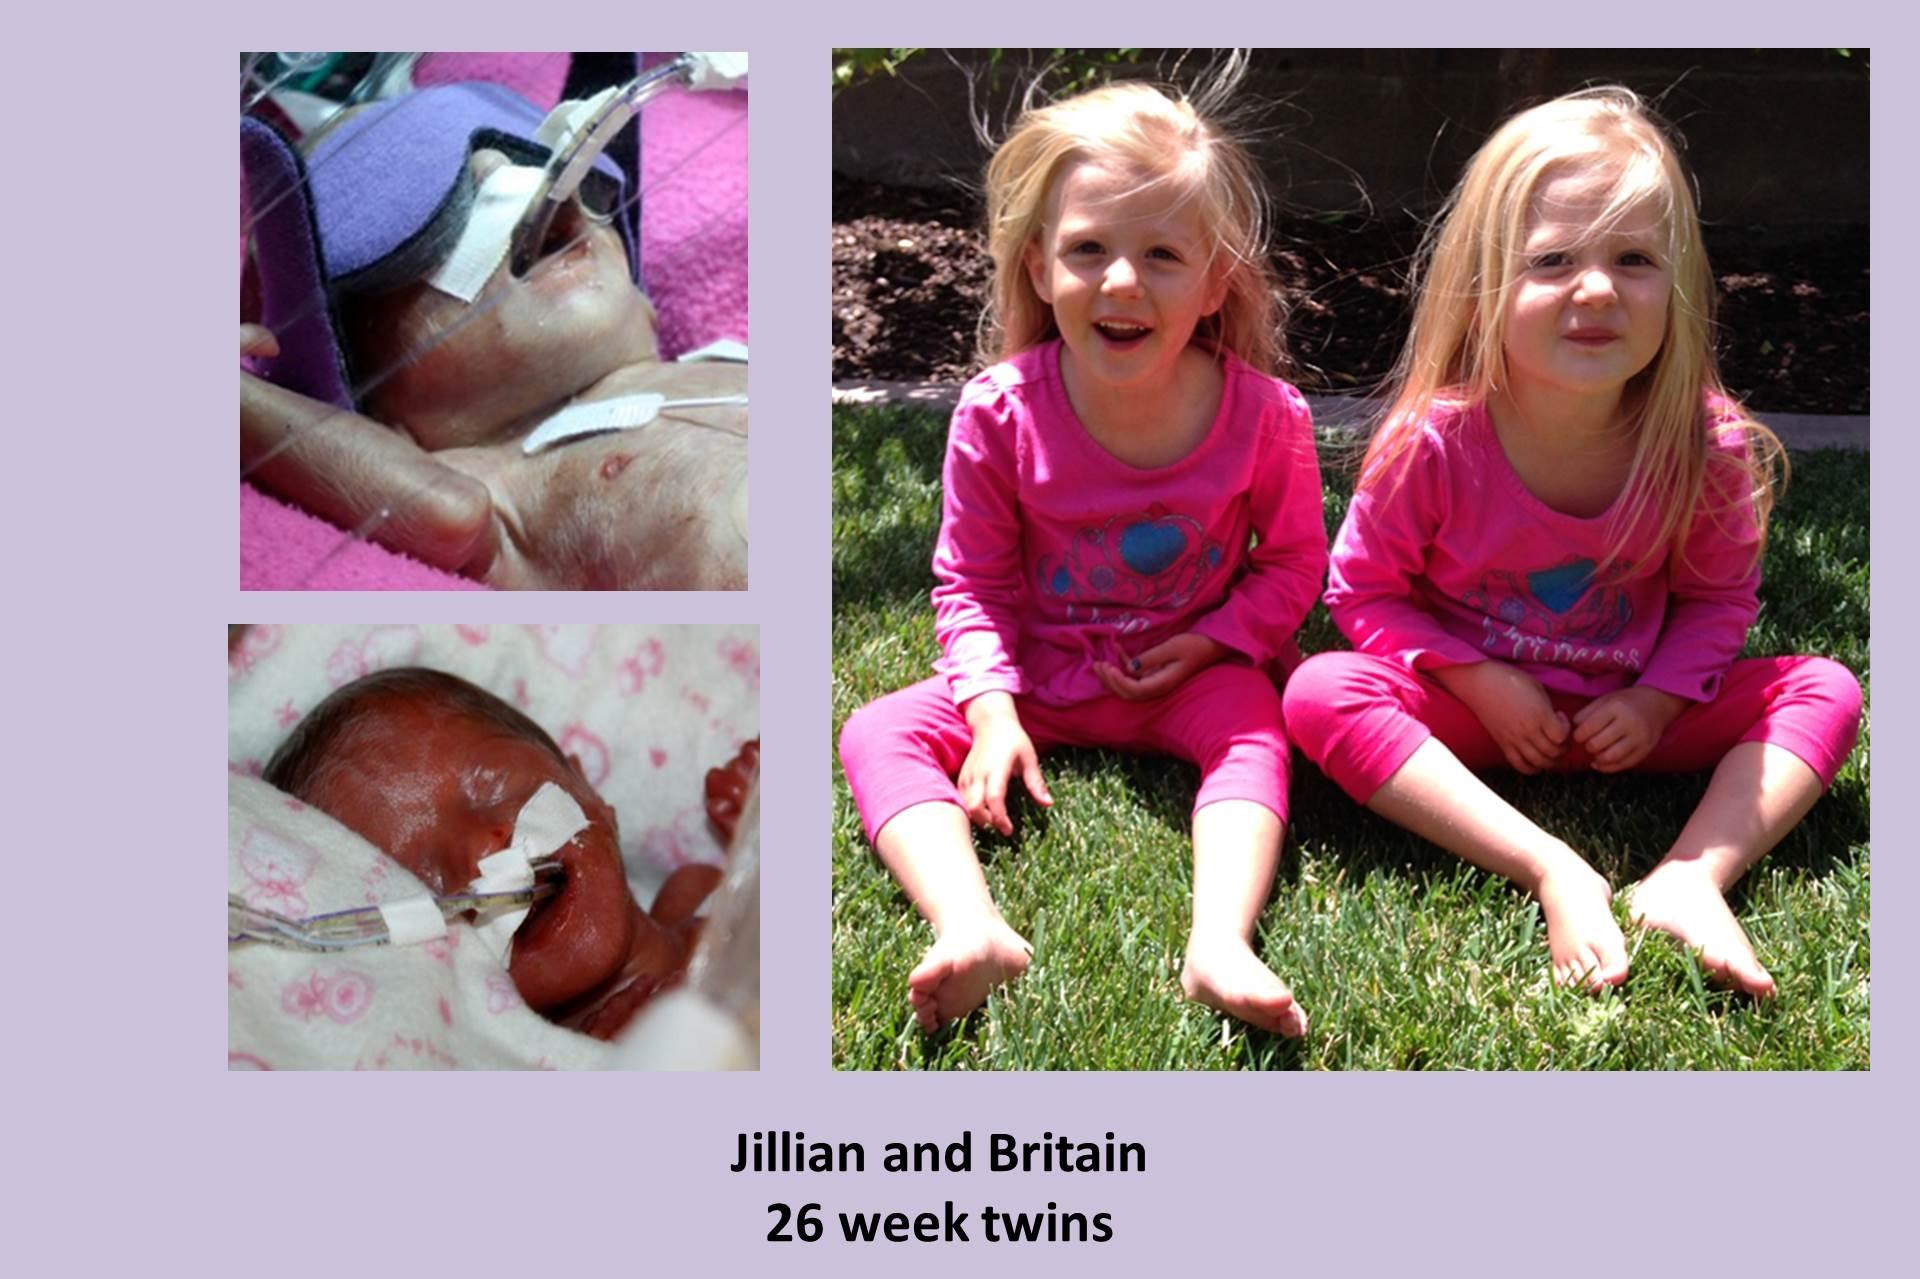 Hallway of Hope: Jillian and Britain